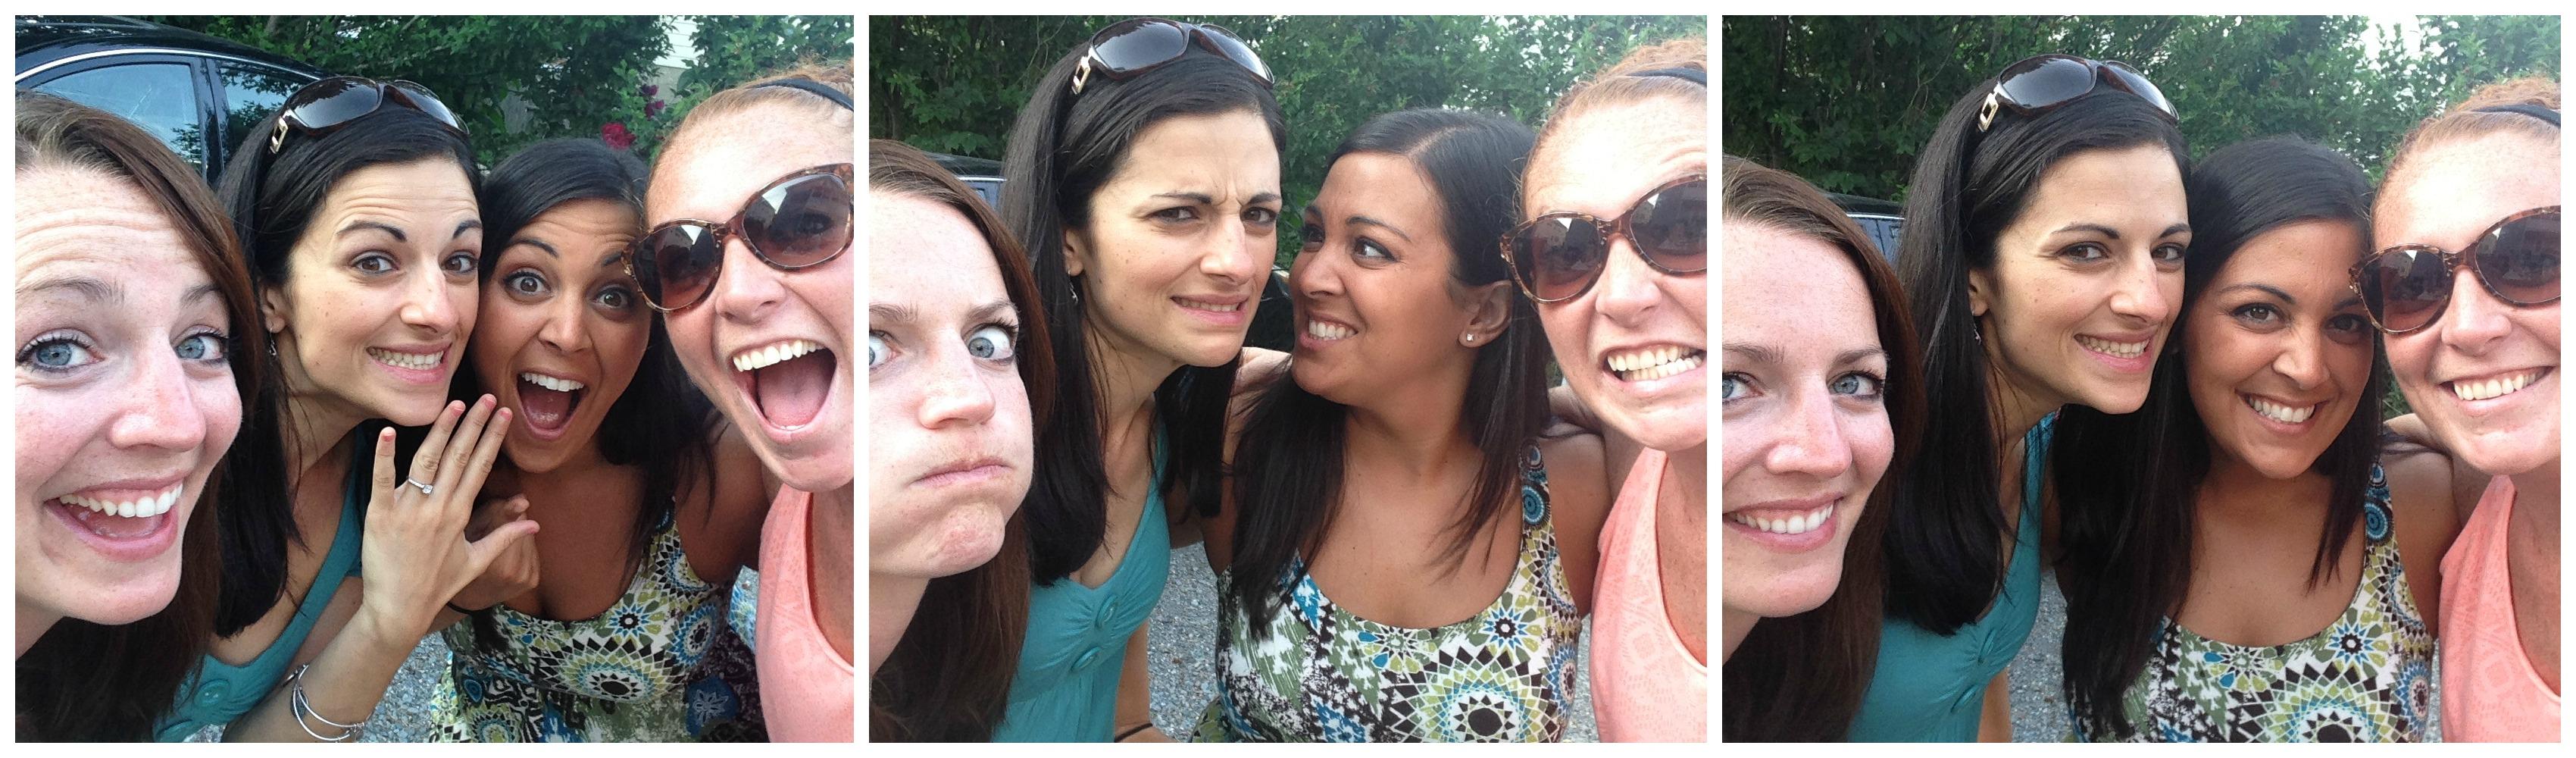 Engagement BBQ: Girls